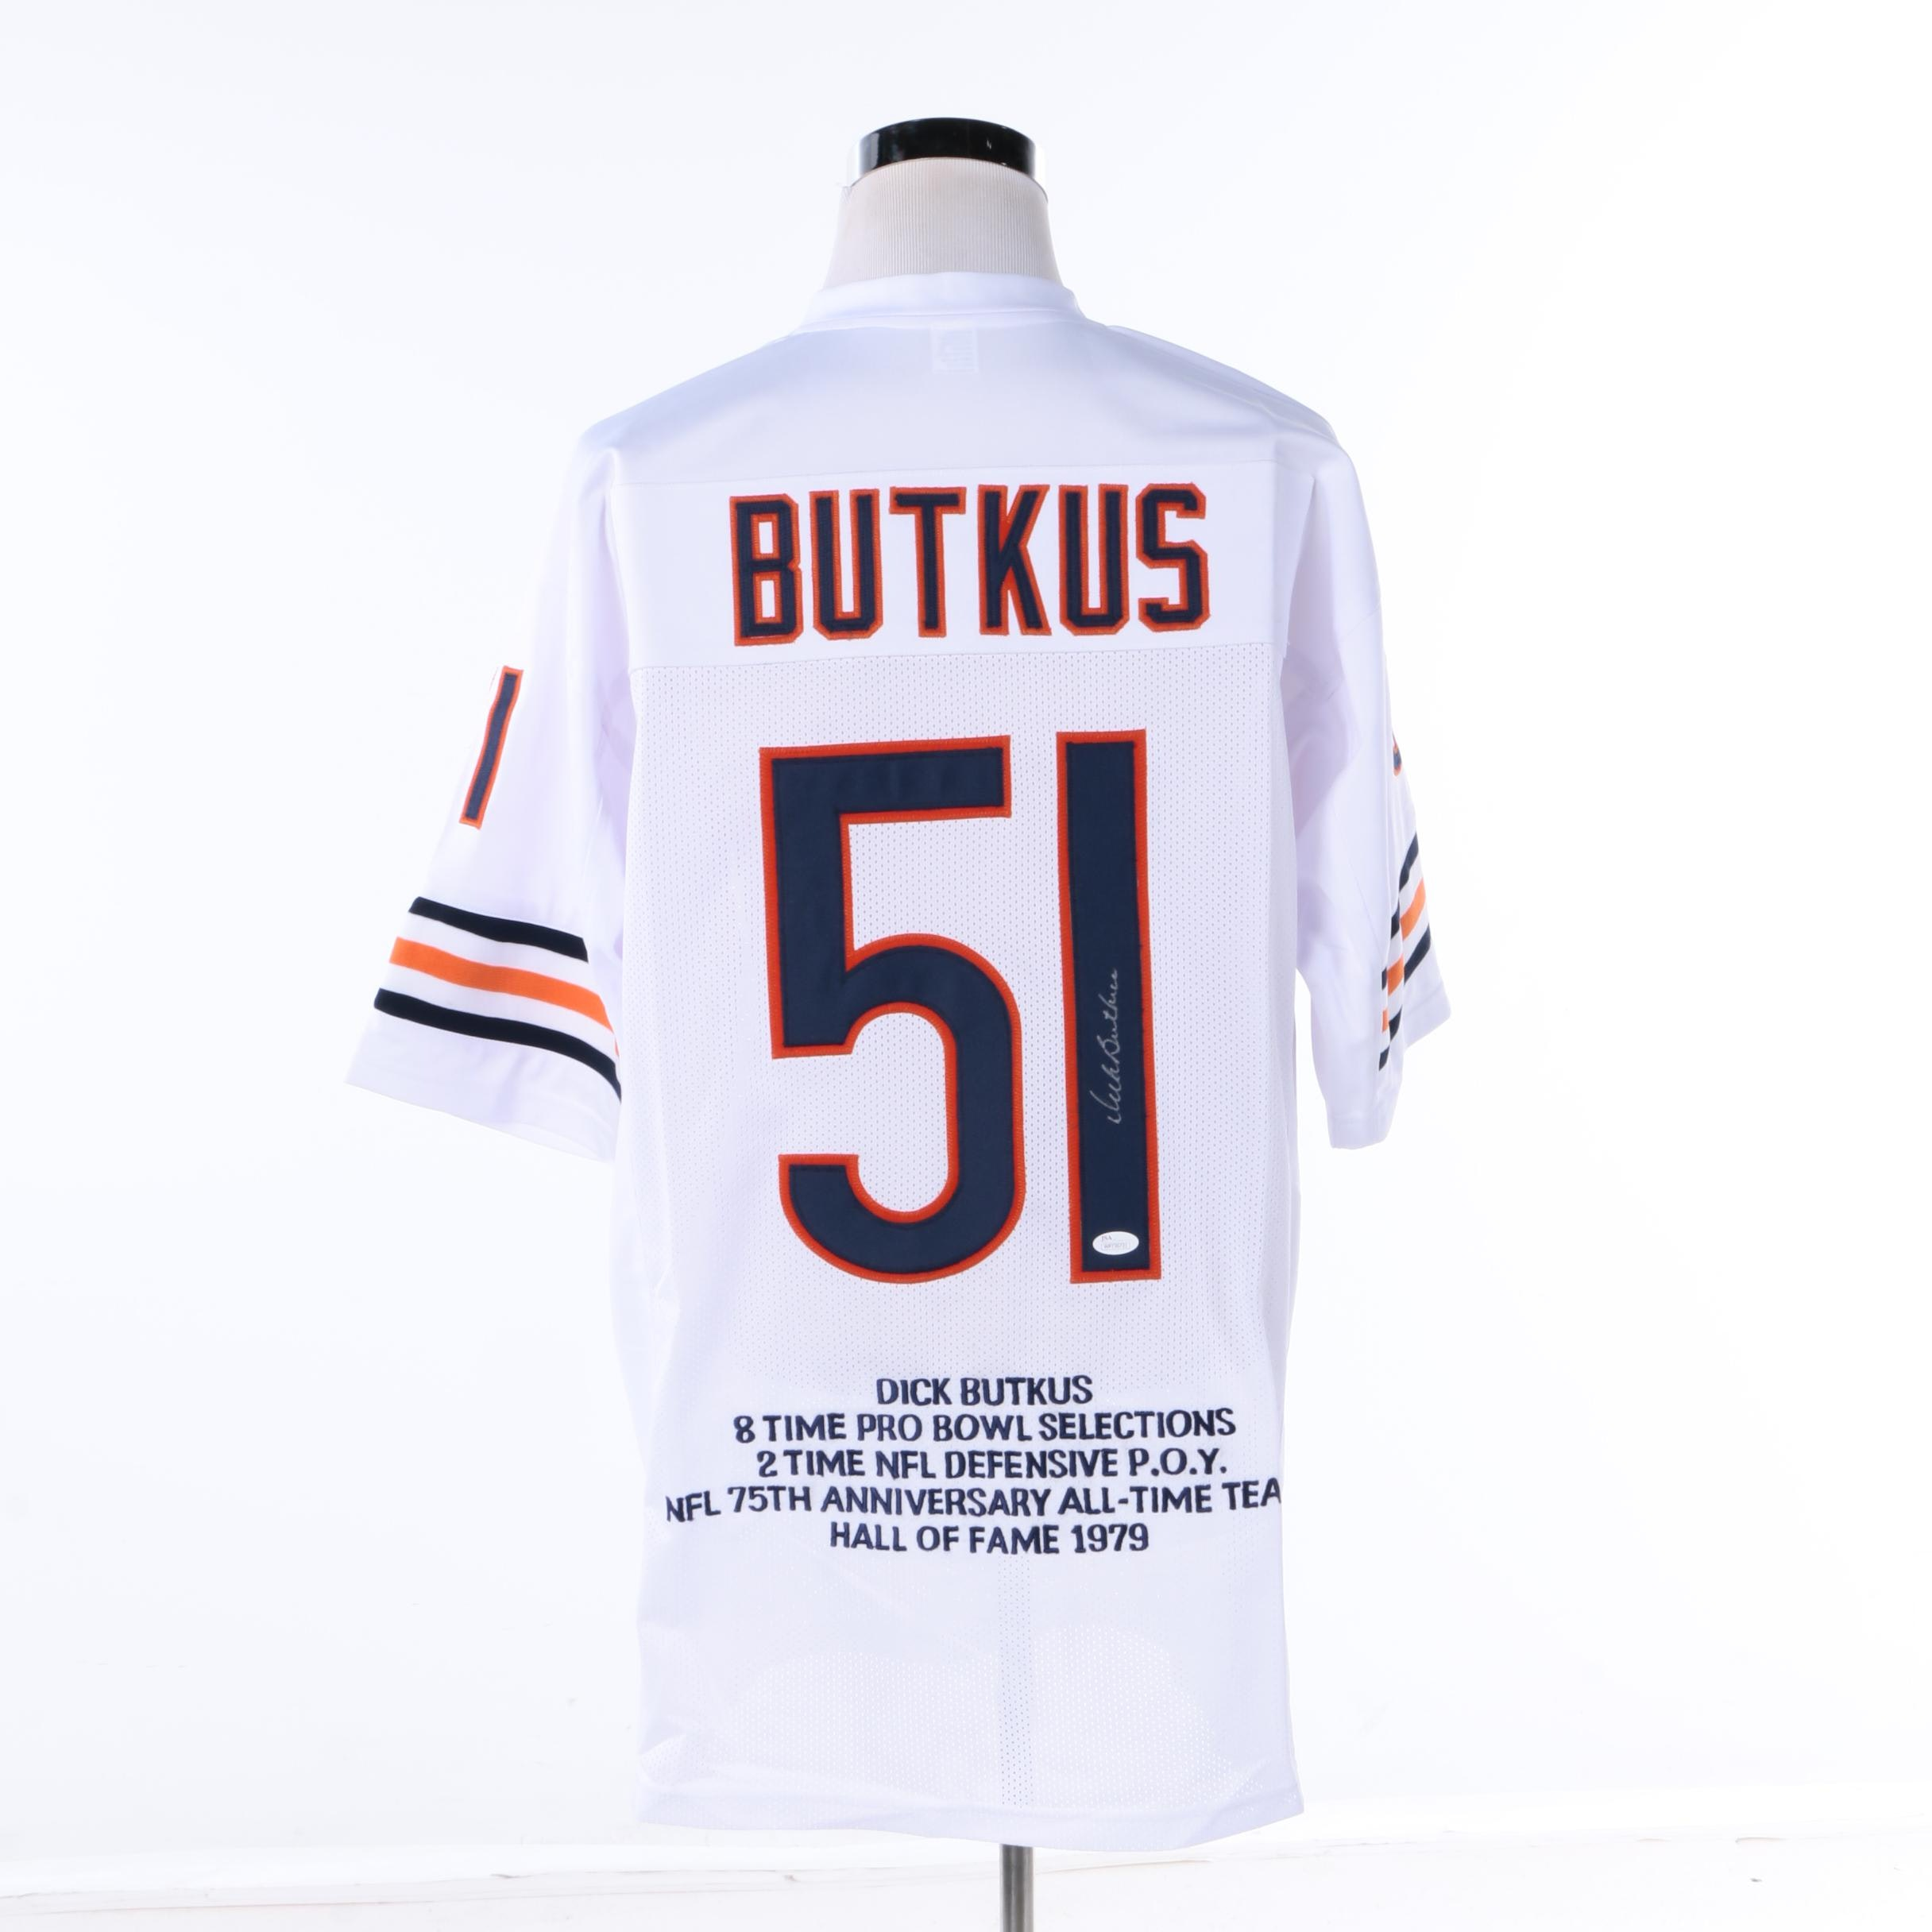 Dick Butkus Autographed Chicago Bears Jersey - JSA COA